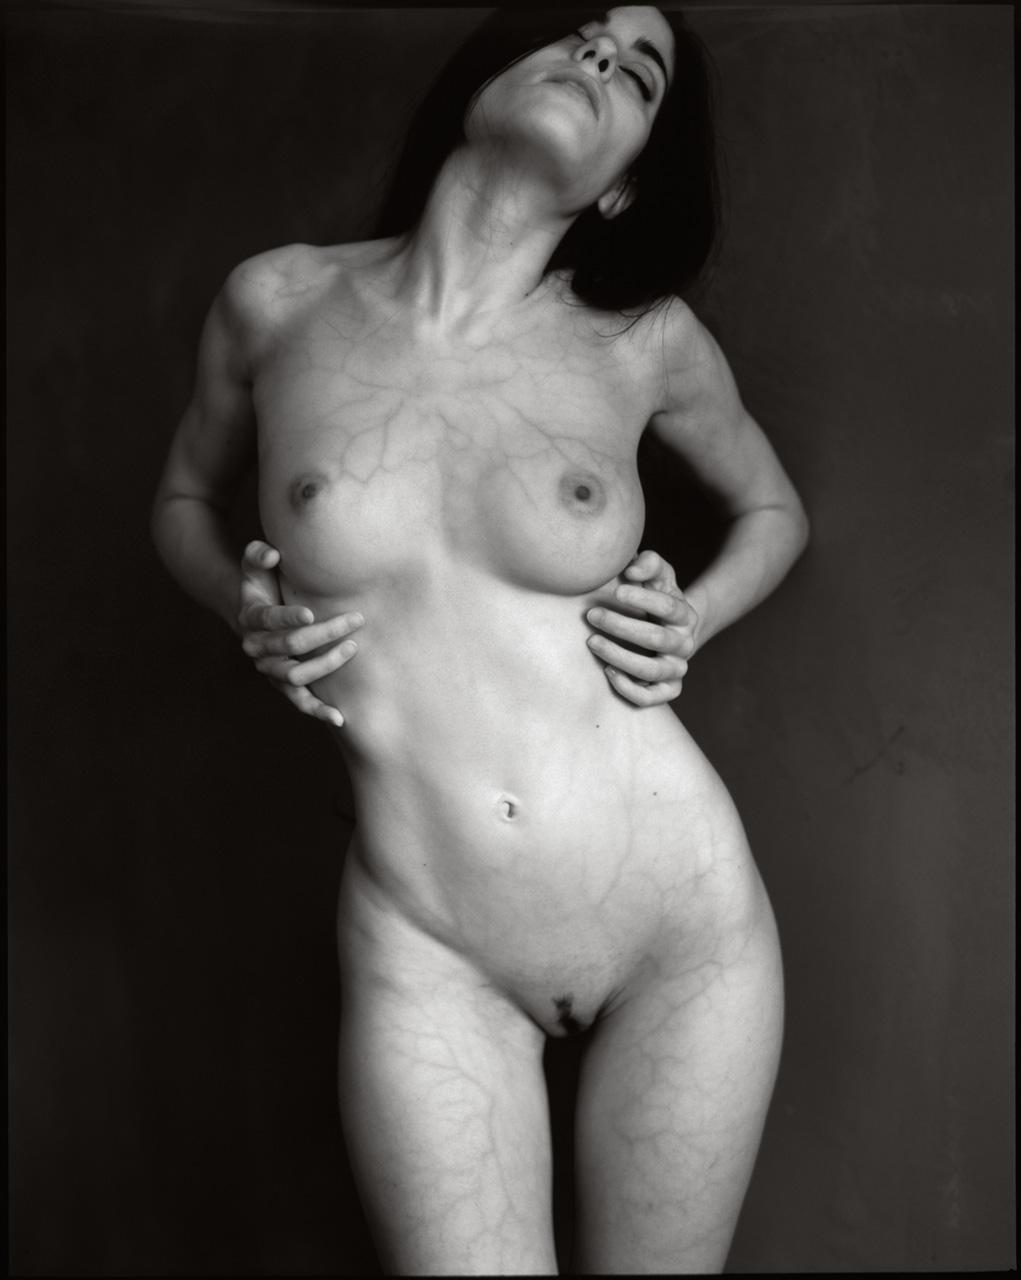 Infrared art nude female body photography by Fabien Queloz, ElleStudio Switzerland